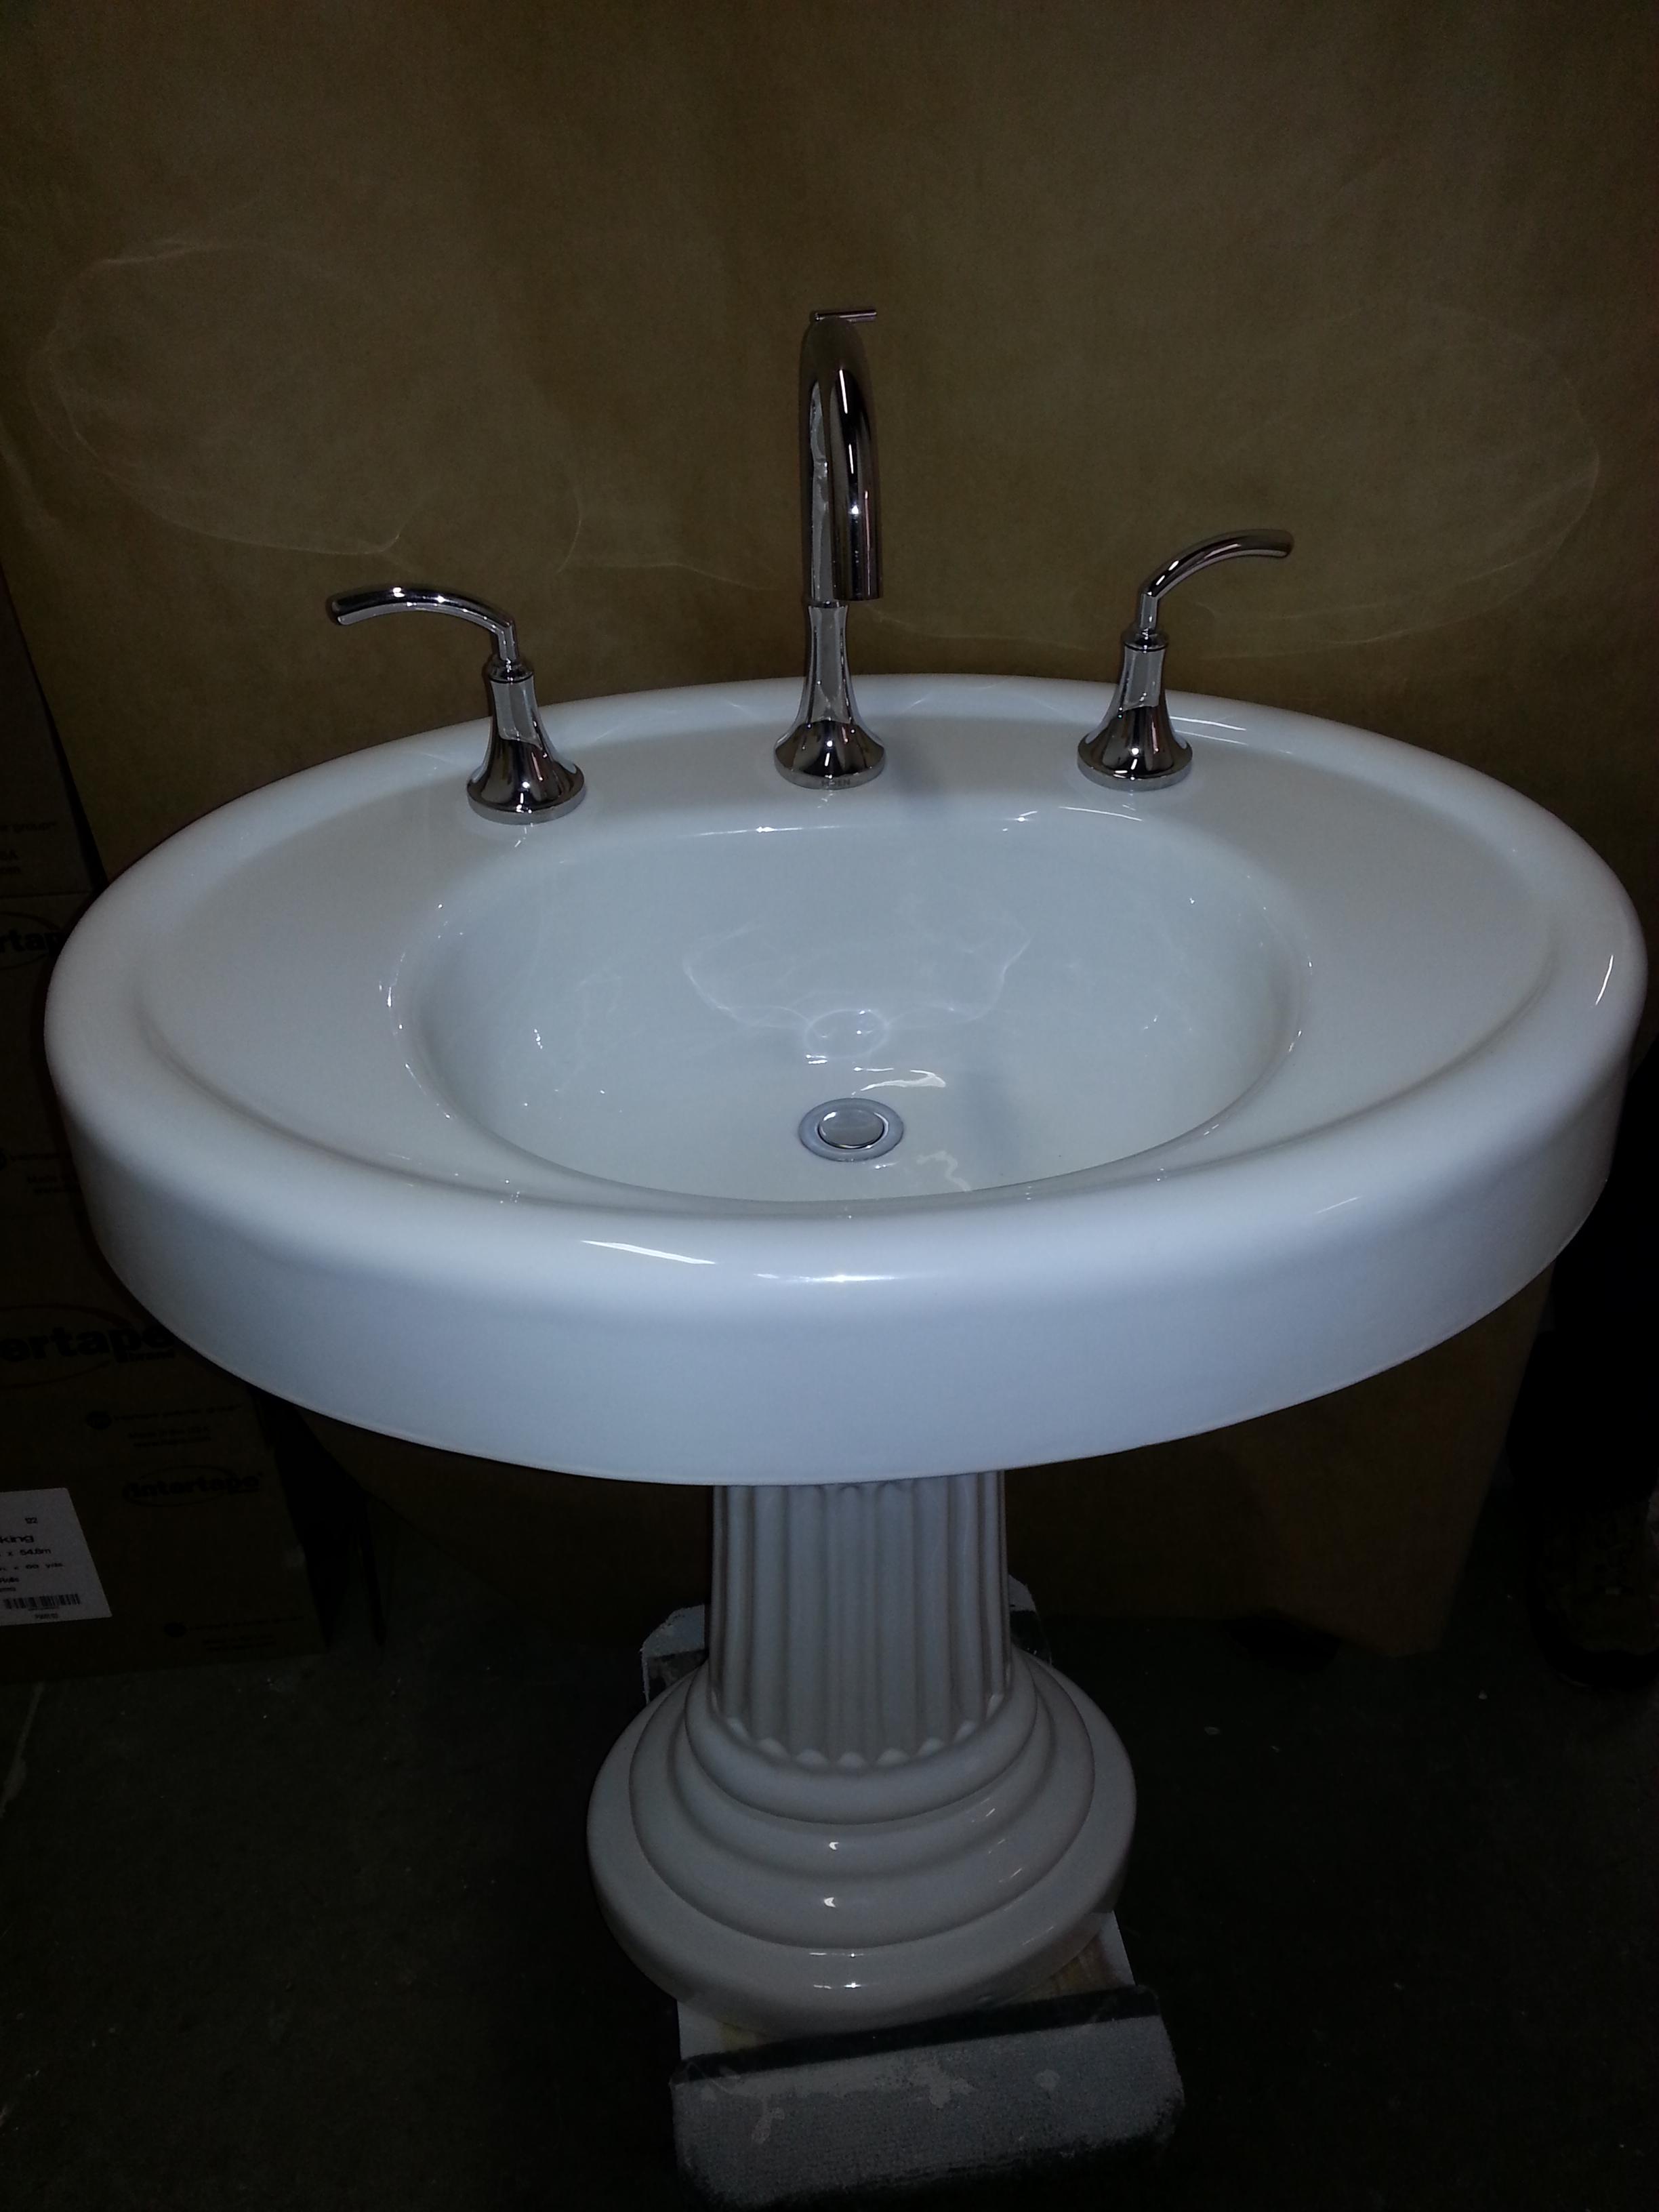 Product For Sale ARK Porcelain Refinishing - Refinish chrome bathroom fixtures